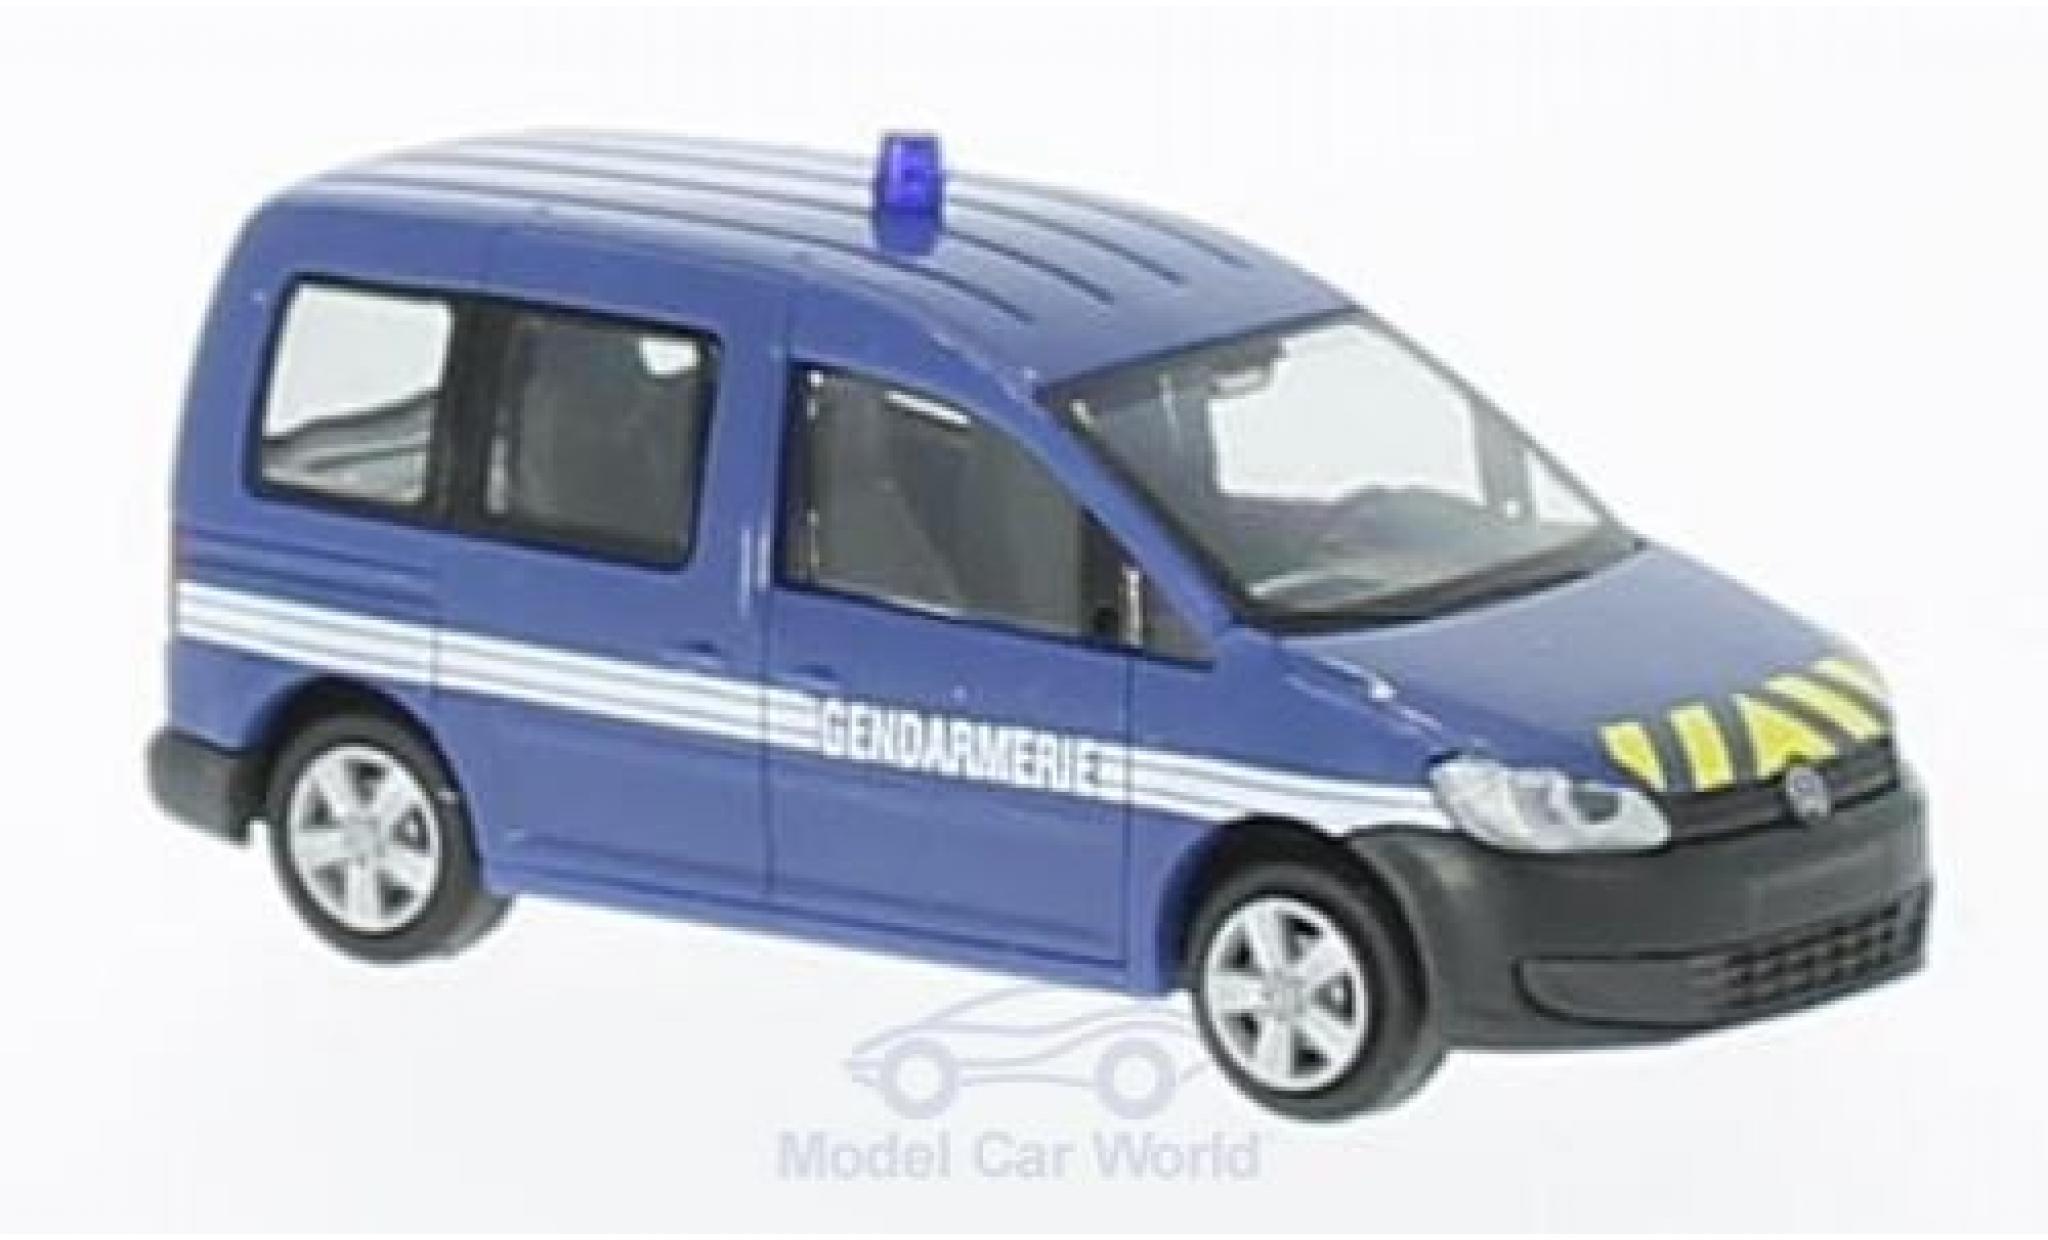 Volkswagen Caddy 1/87 Rietze Gendarmerie (F) 2011